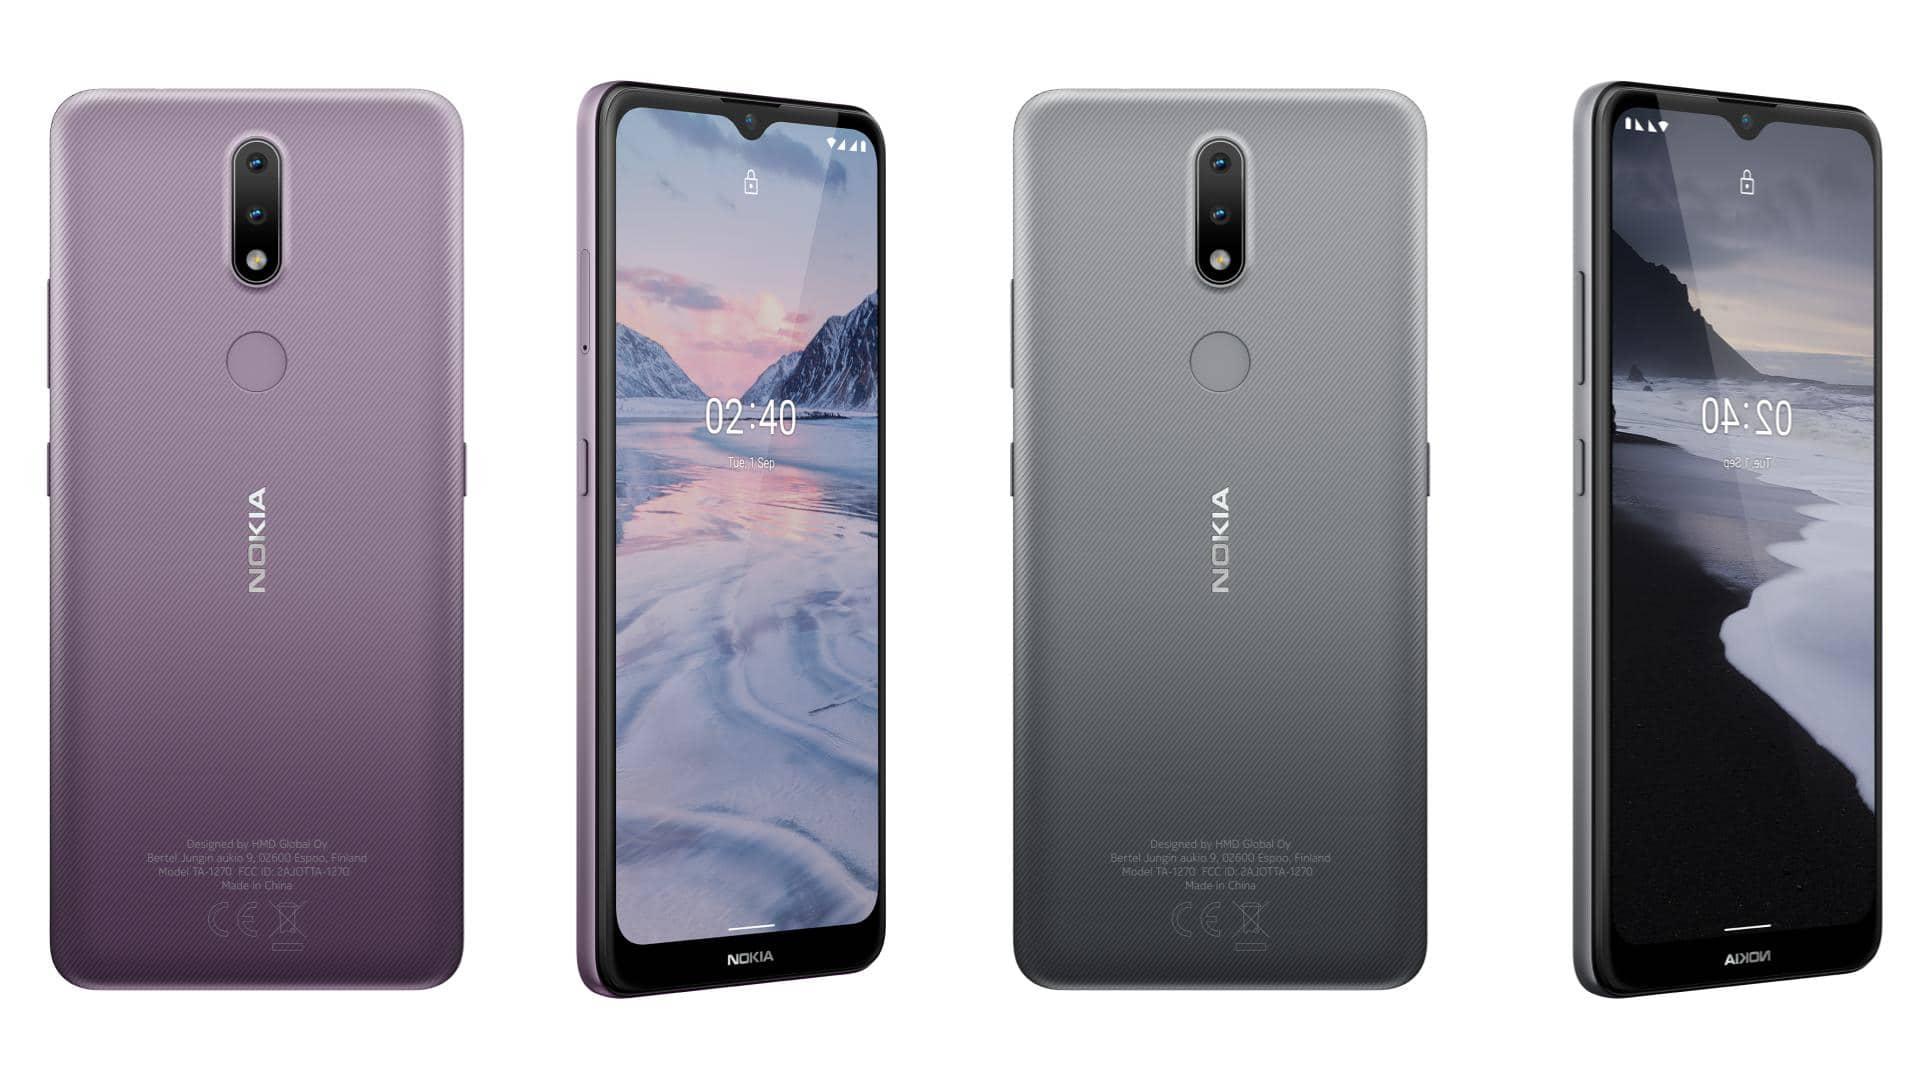 00 Nokia 2 4 pressers